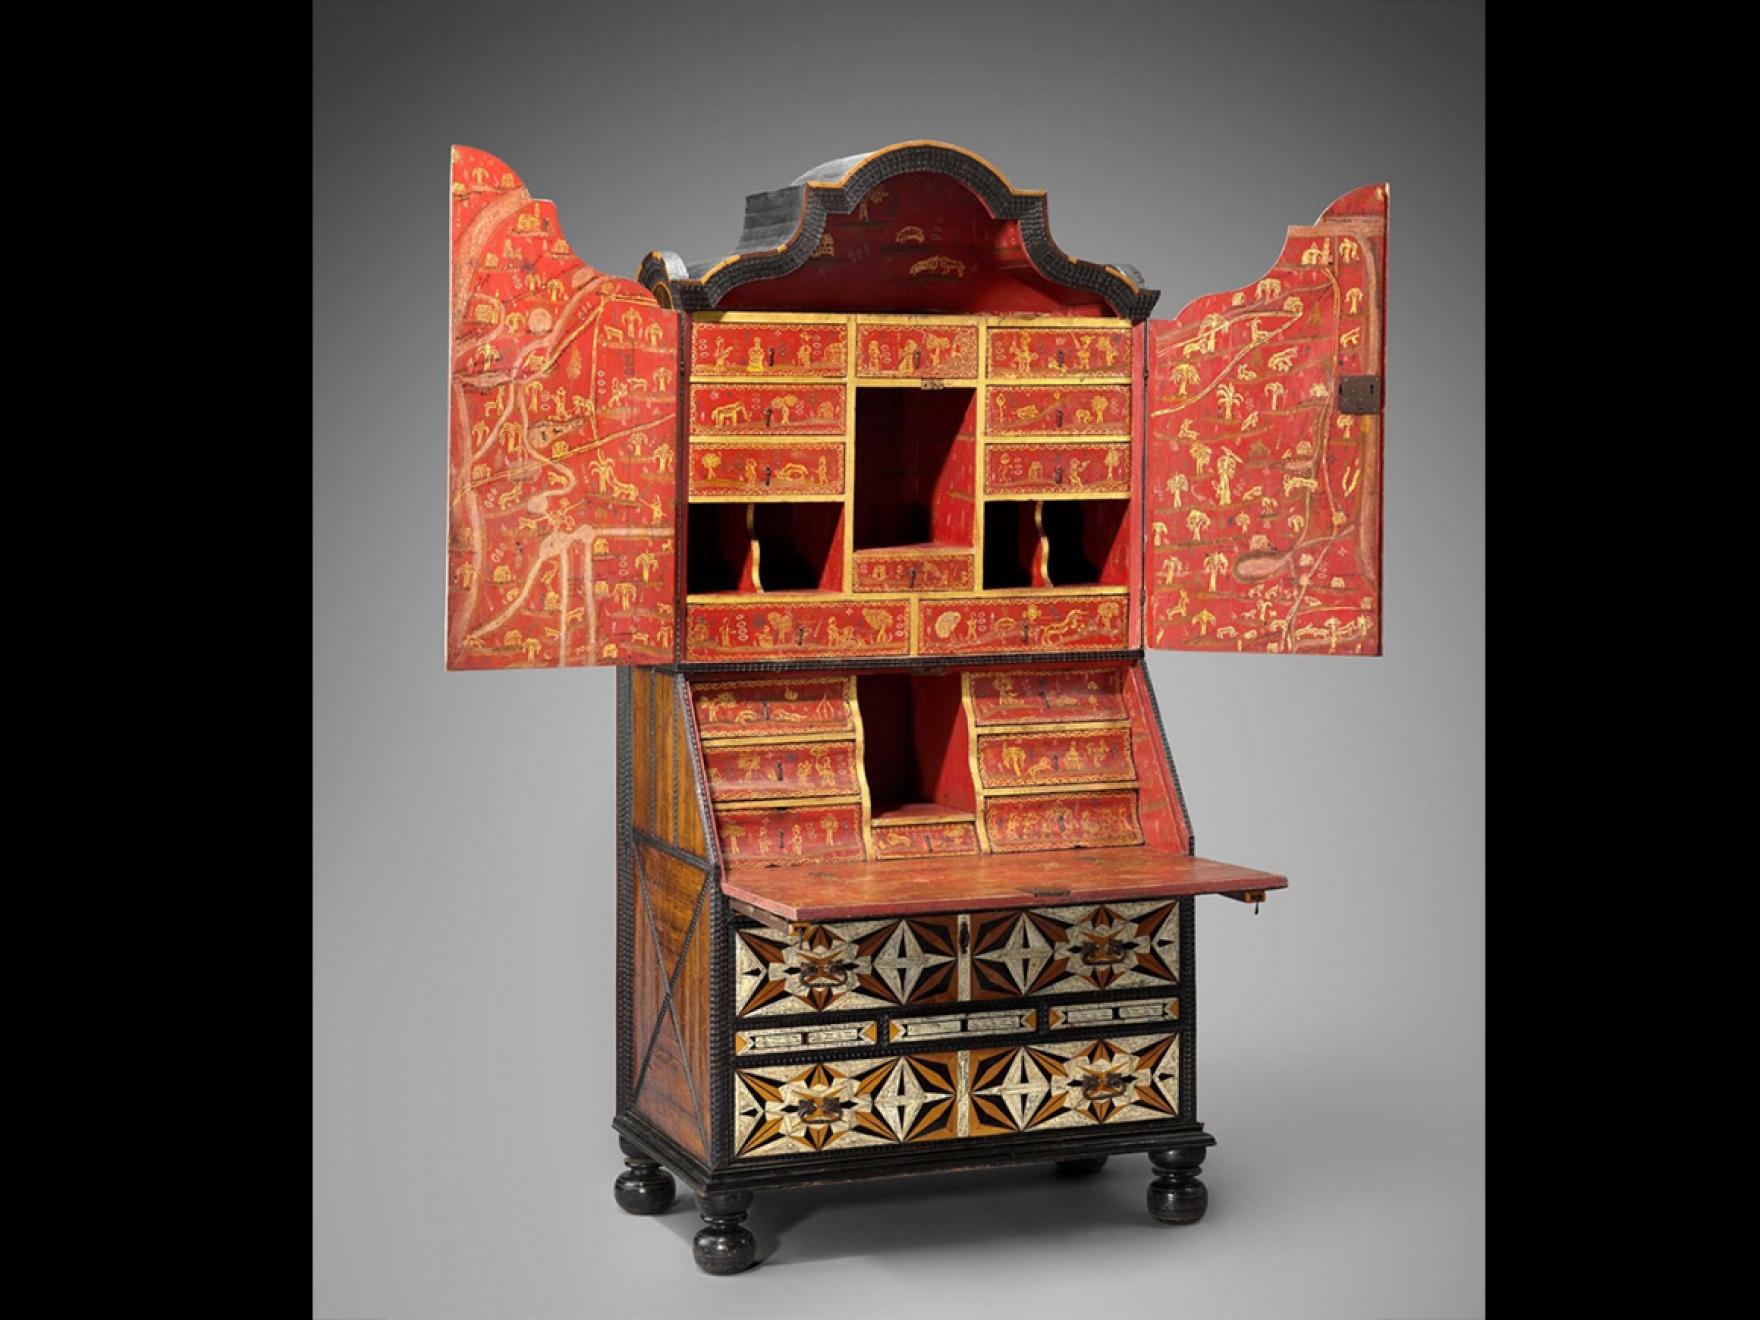 Desk and bookcase, Puebla, Mexico, mid 18th century